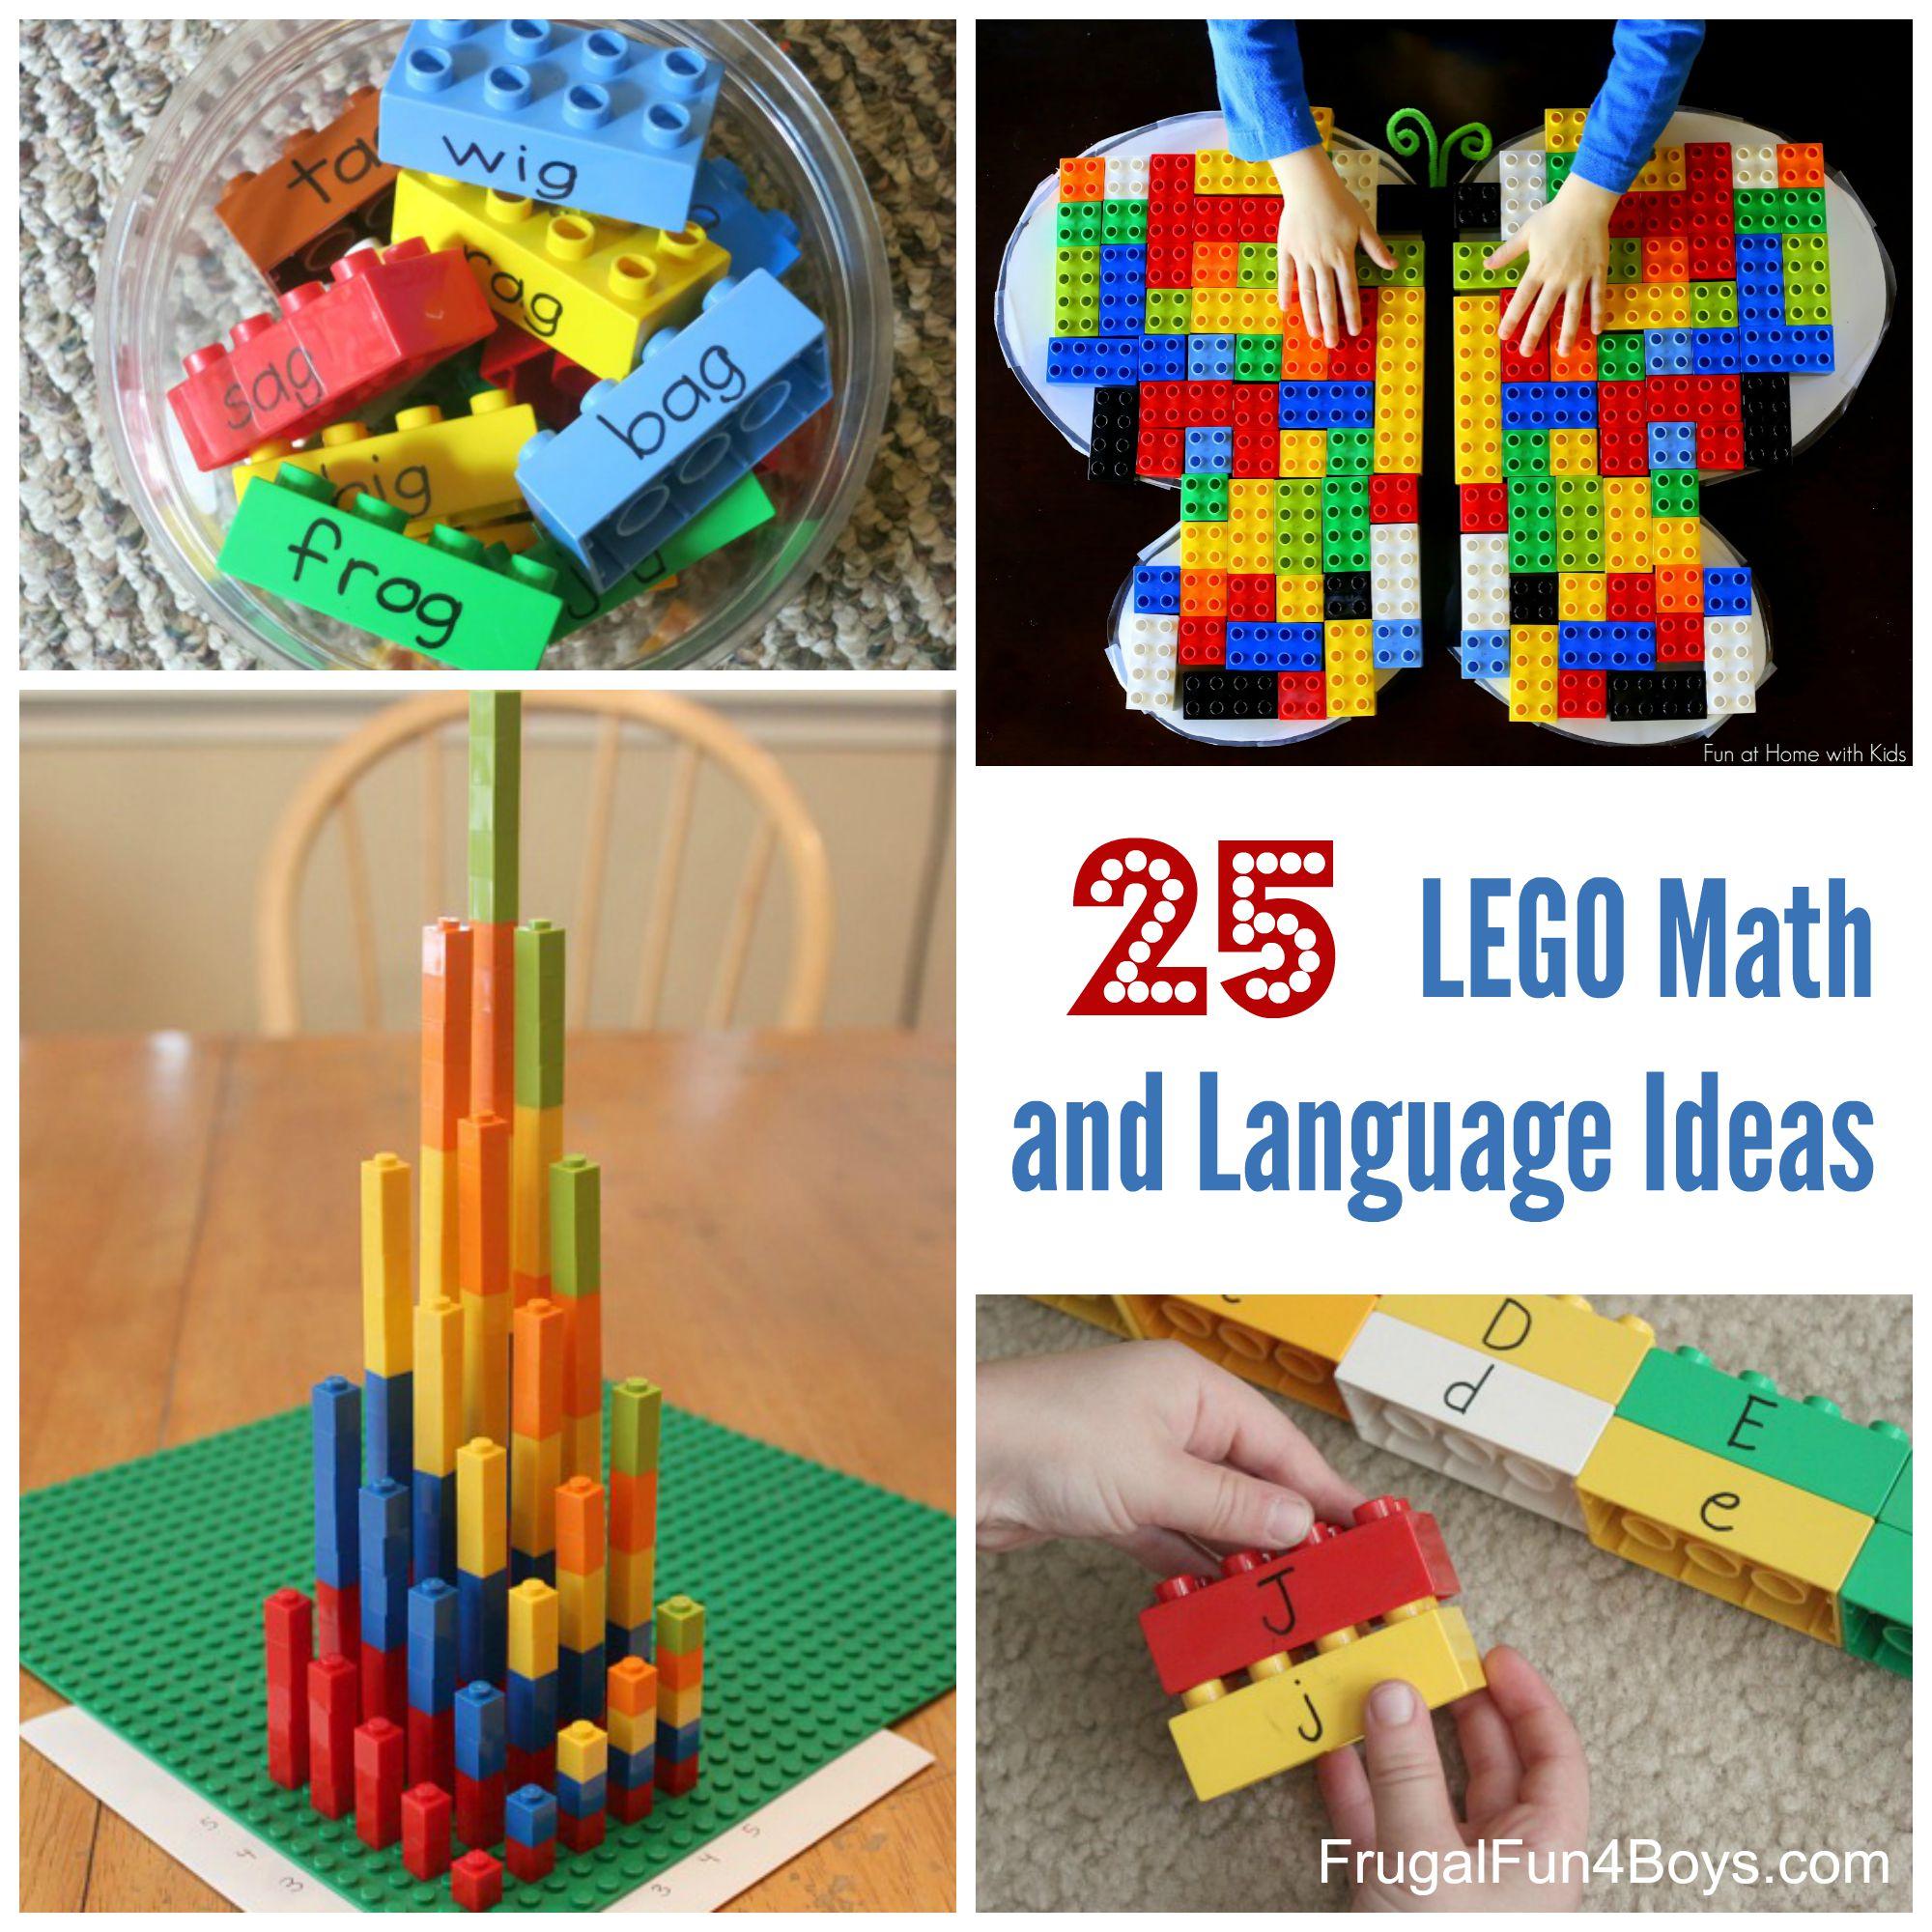 Lego Learning 25 Math And Language Ideas For Preschool Through Third Grade